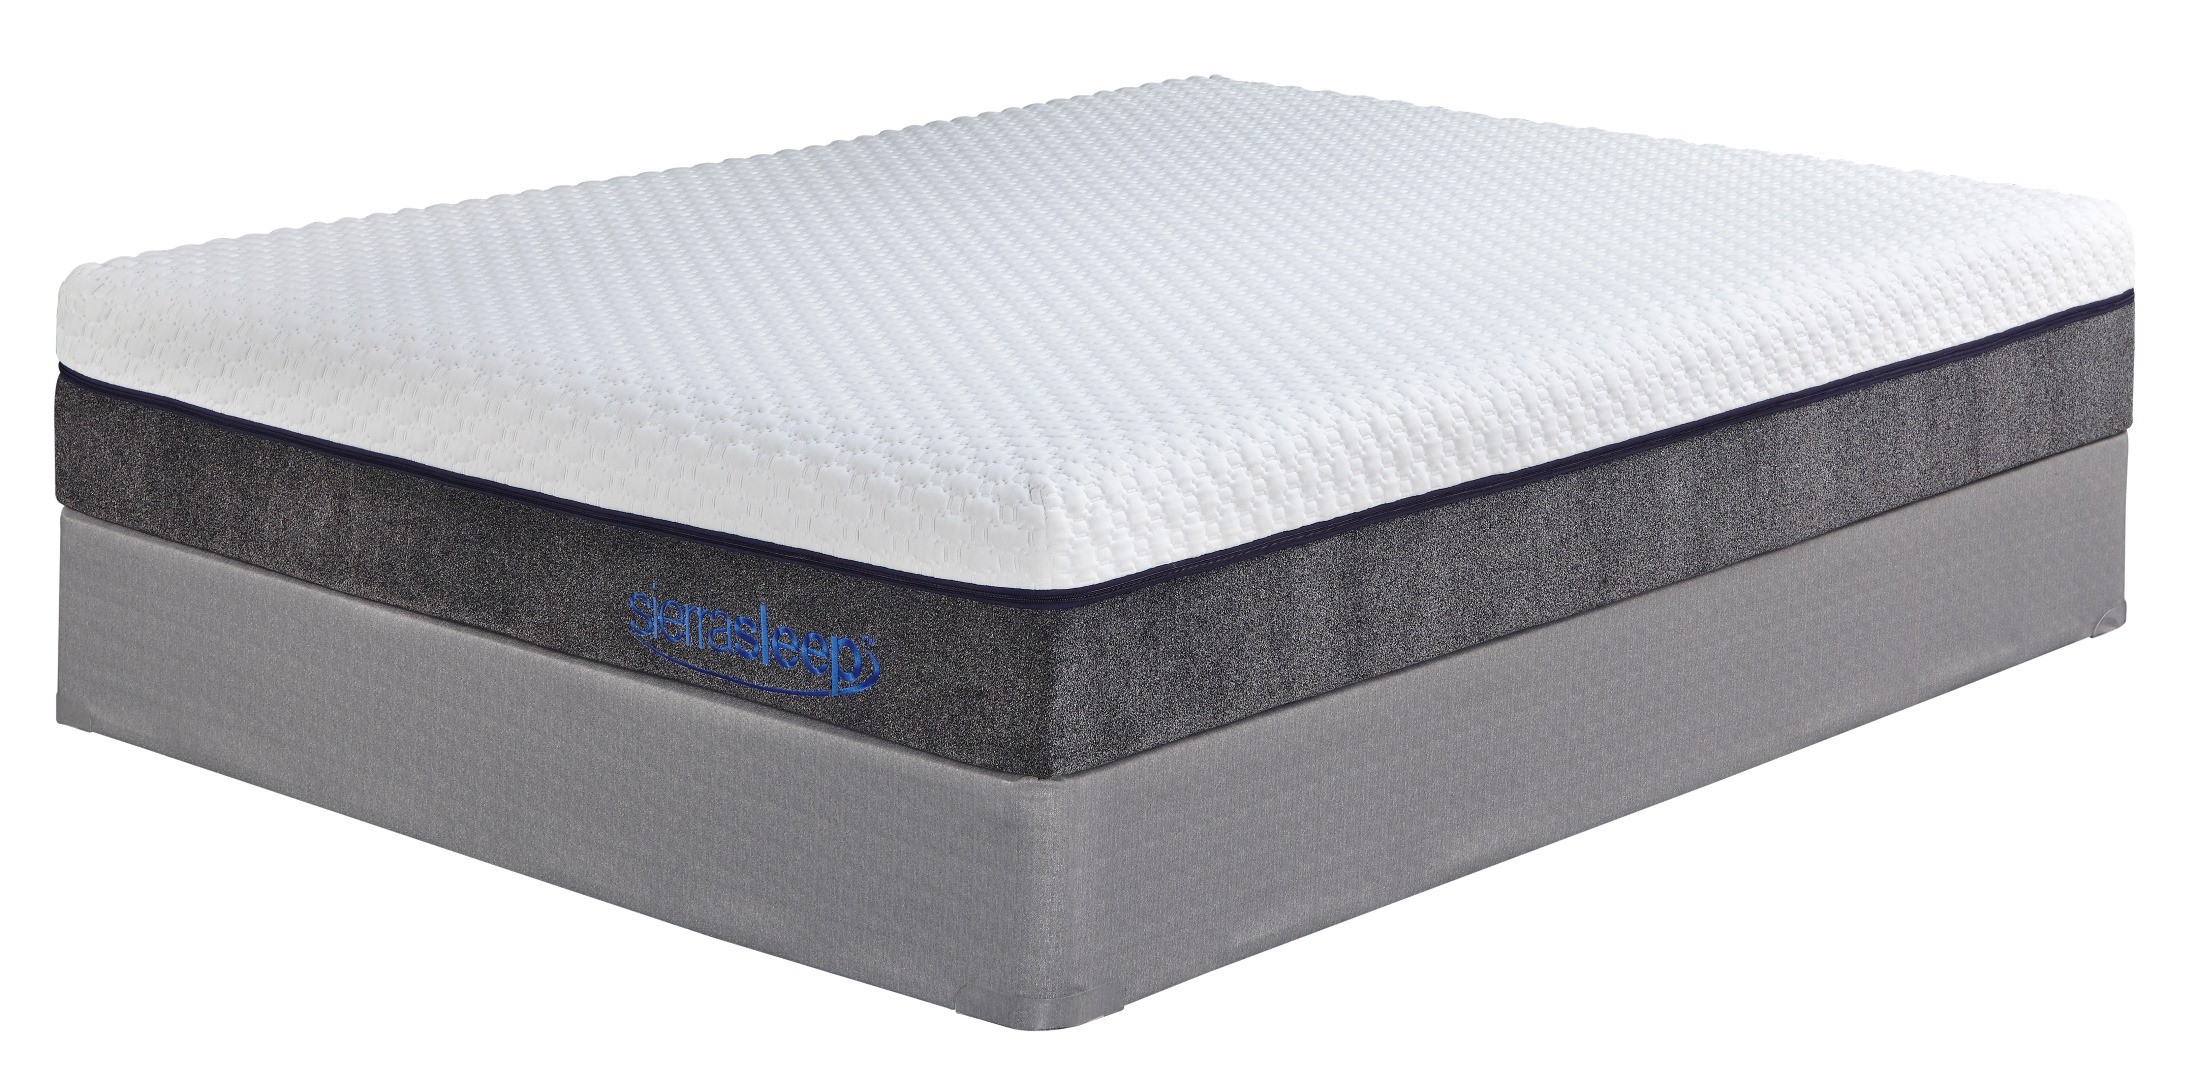 how to make be mattress white